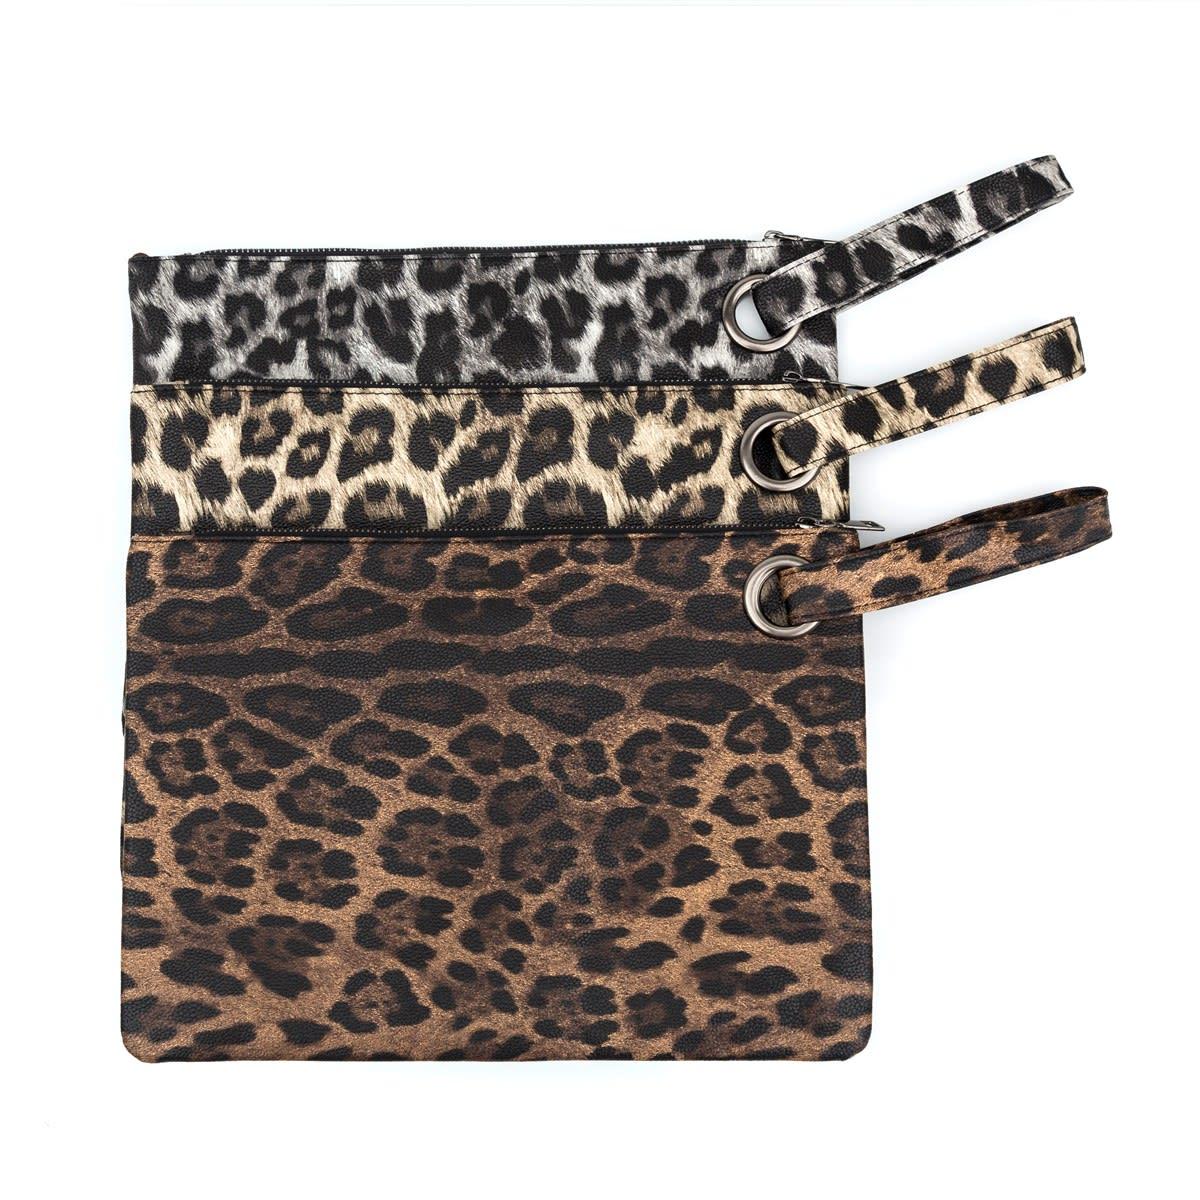 Leopard Print Oversized Clutch